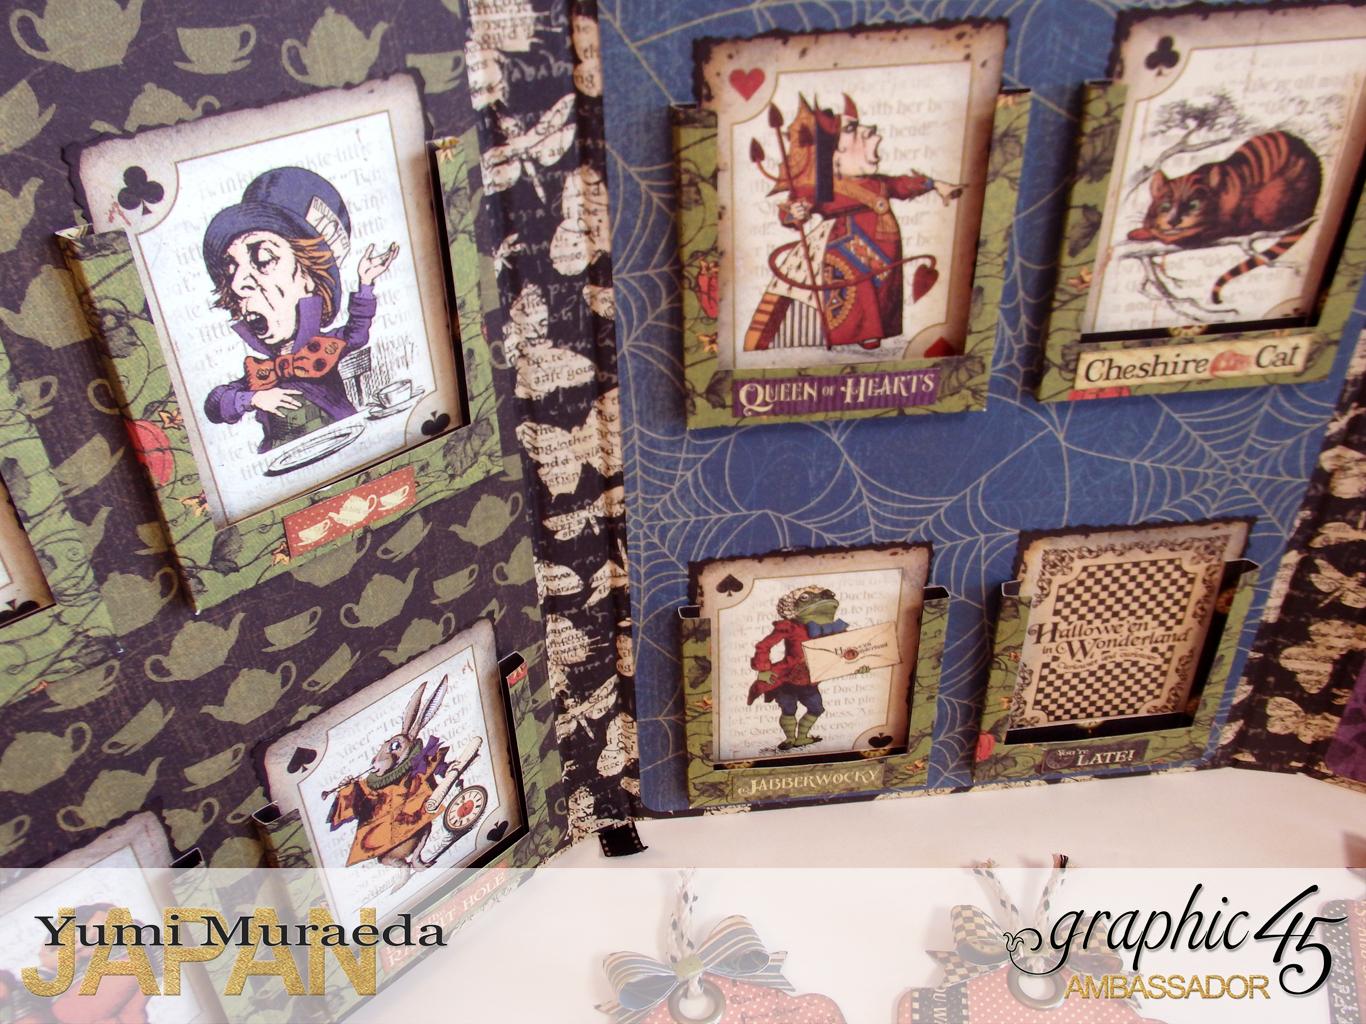 11ATC WonderlandHallowe'en in Wonderland by Yumi MuraeadaProduct by Graphic 45